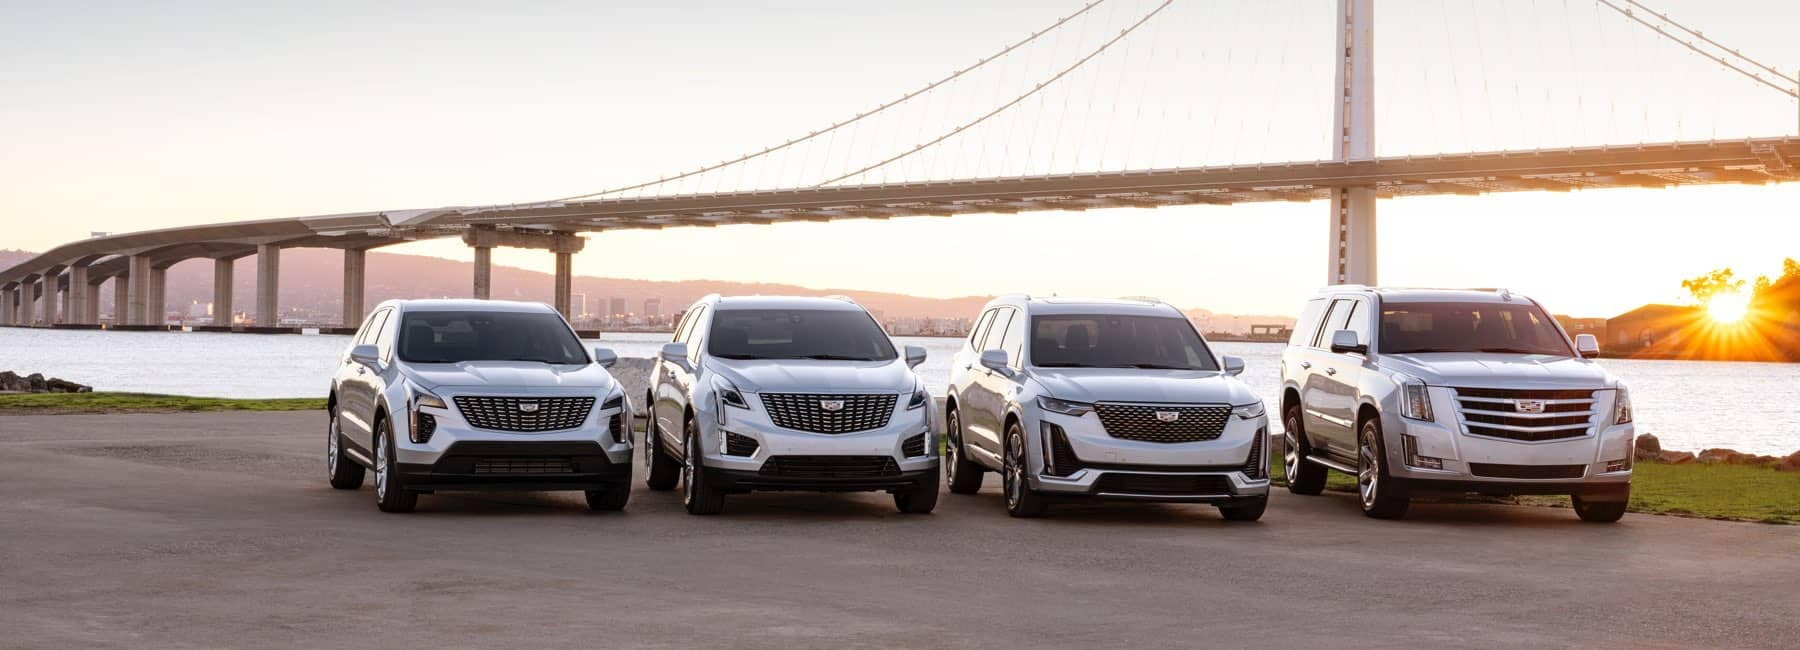 2020 Cadillac line-up